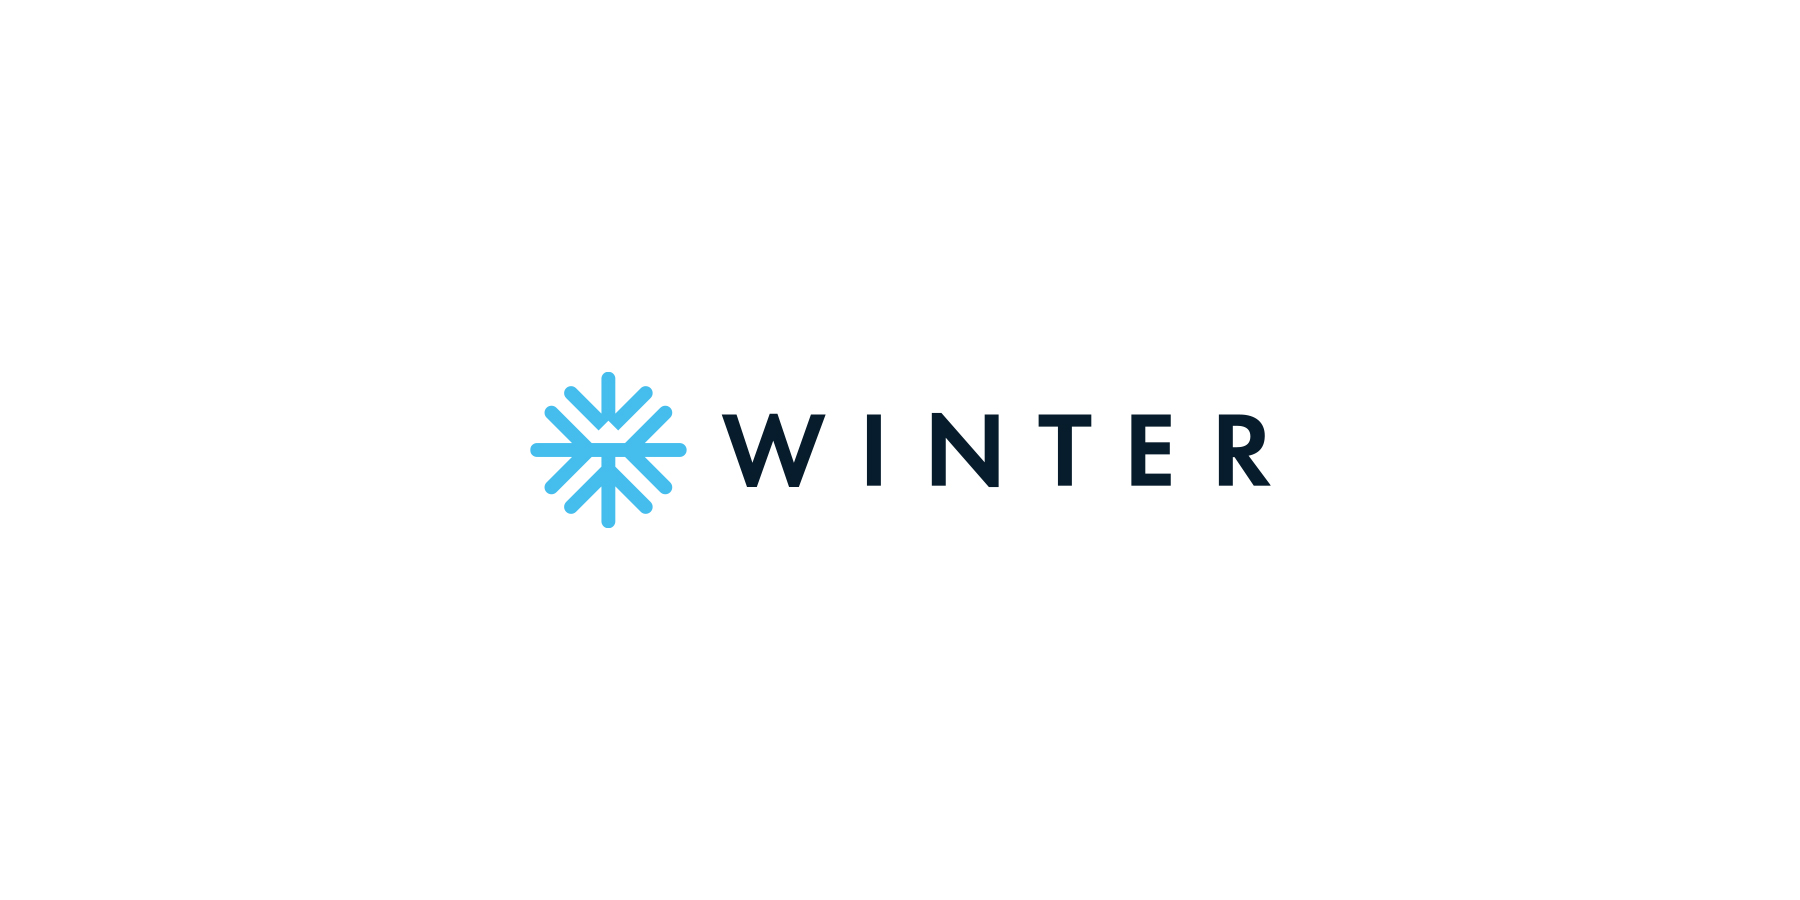 winter-logo-design-01